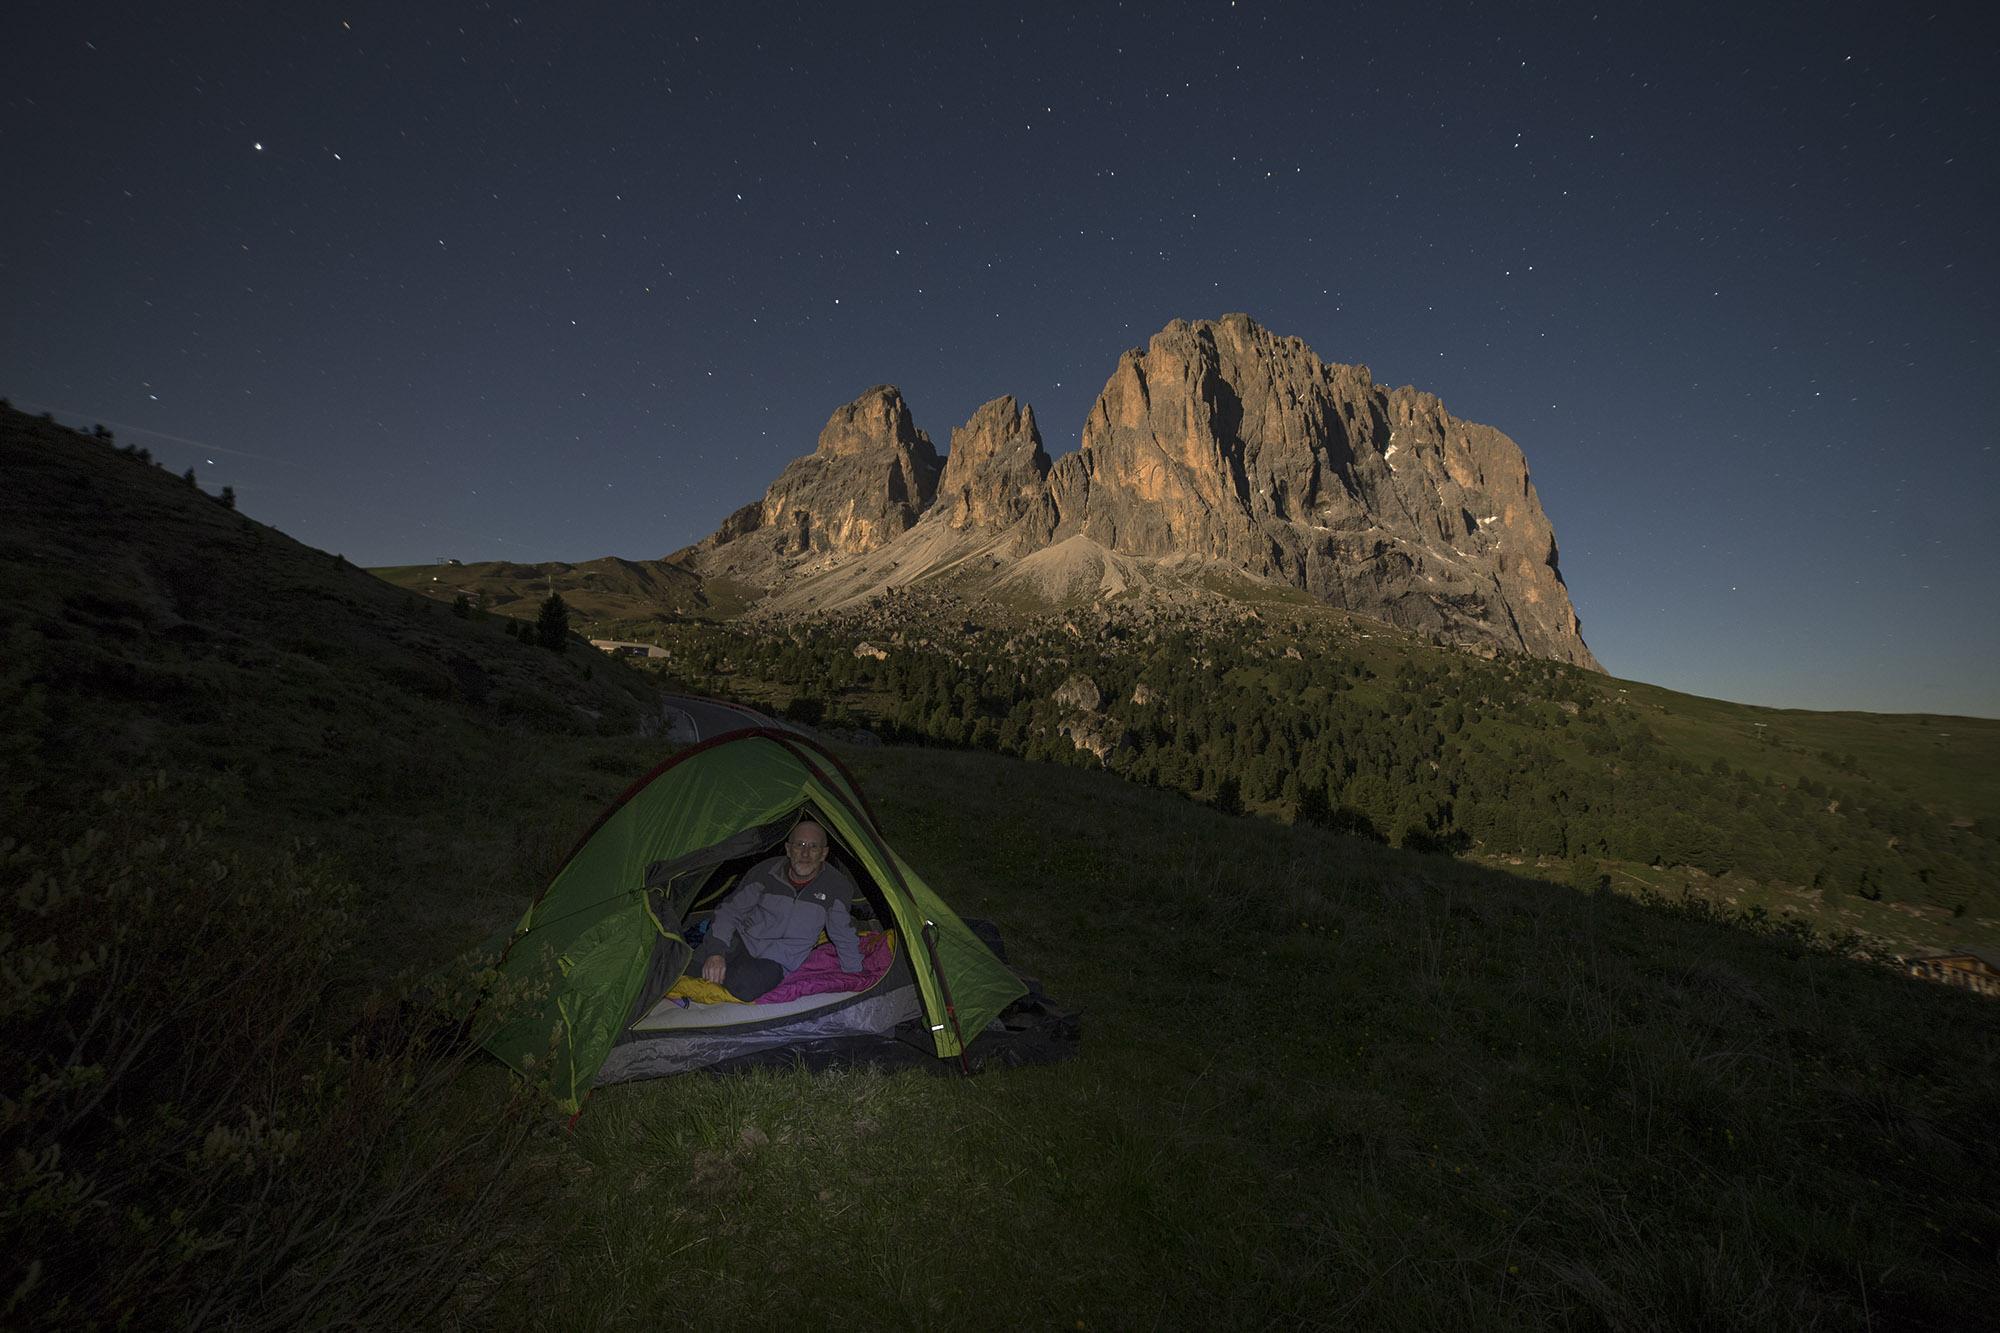 Sassolungo nightscape, Italy